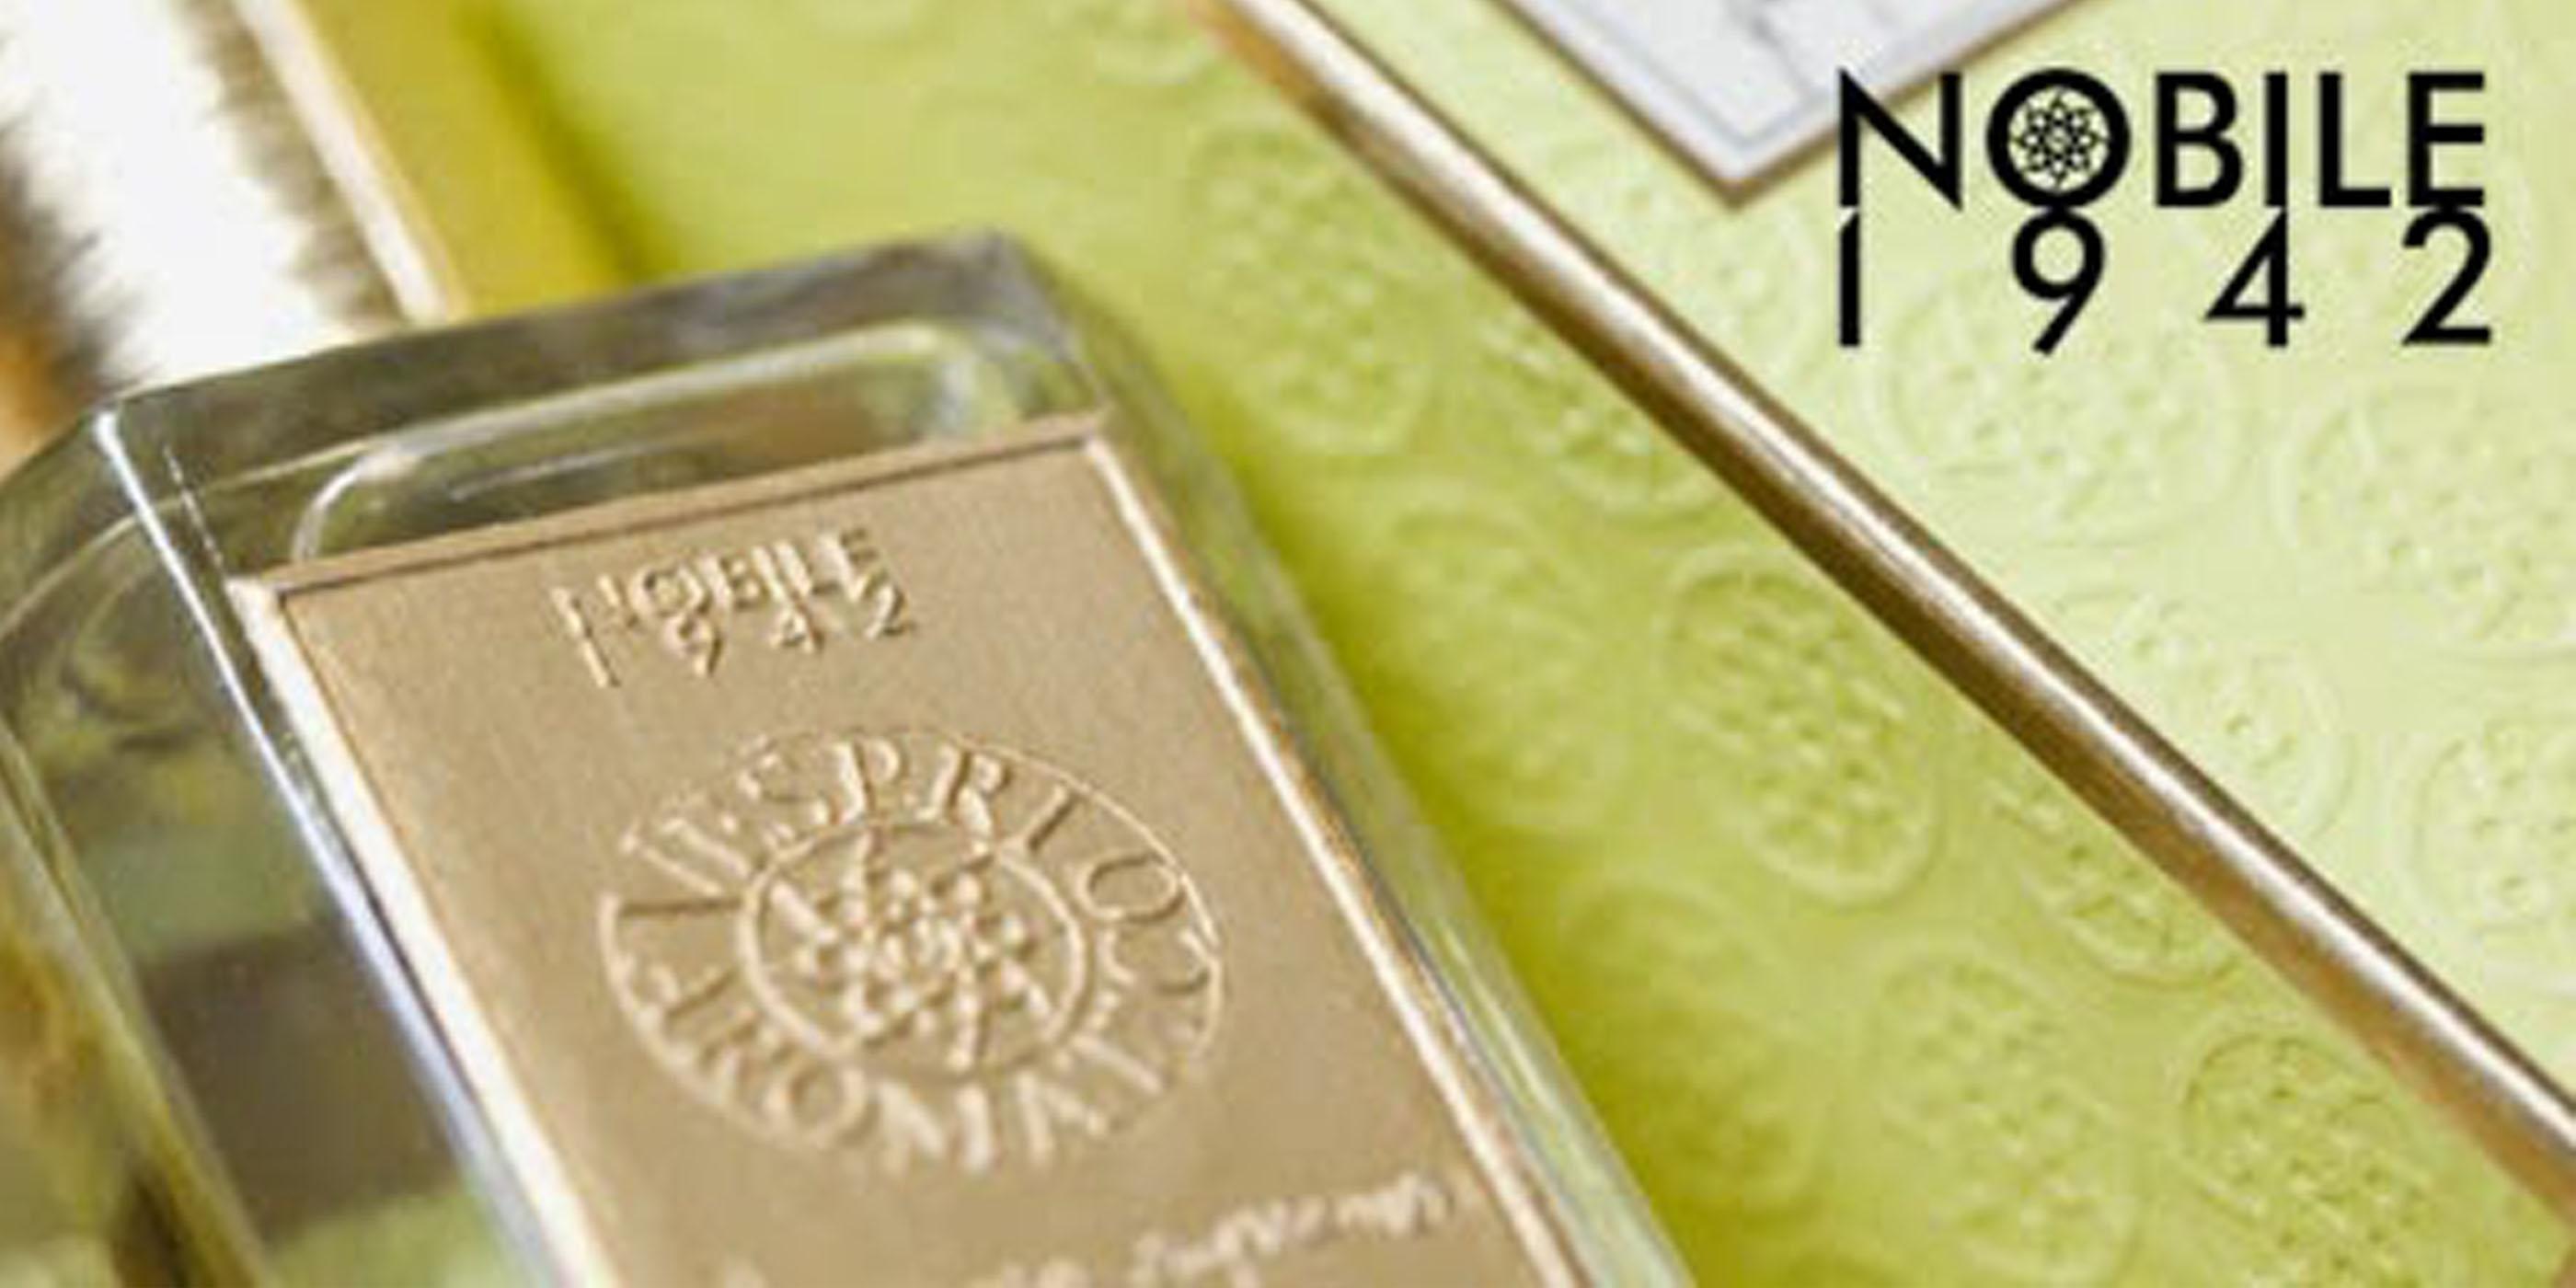 Nobile 1942 Vespri Collection Citrus Fresh Summer Fragrance